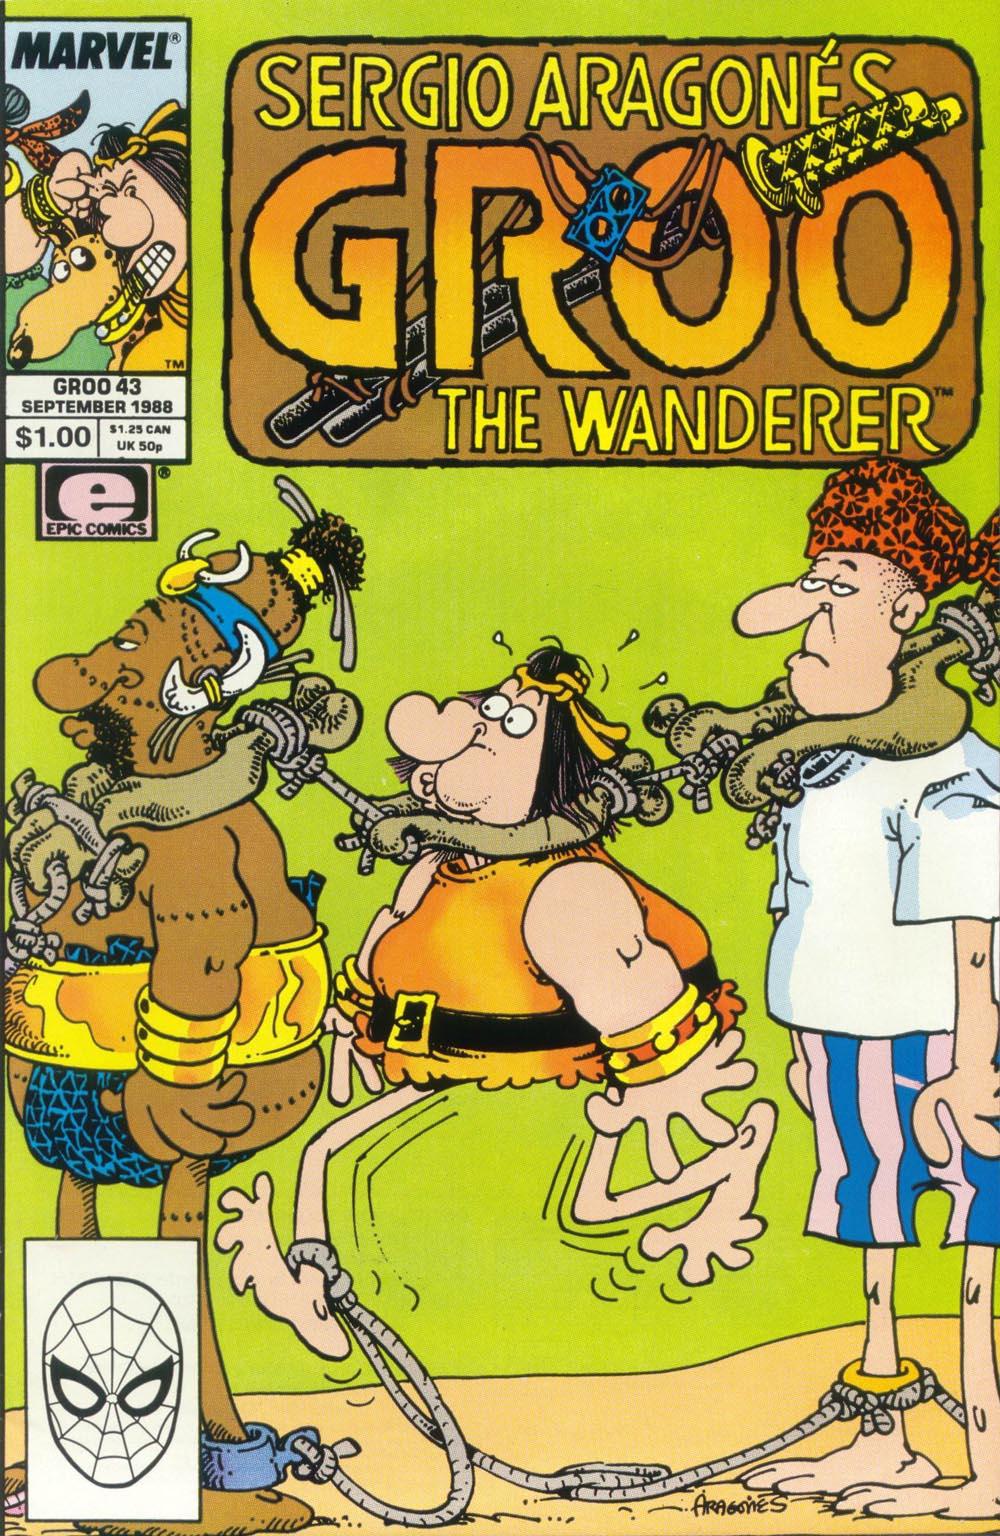 Read online Sergio Aragonés Groo the Wanderer comic -  Issue #43 - 1